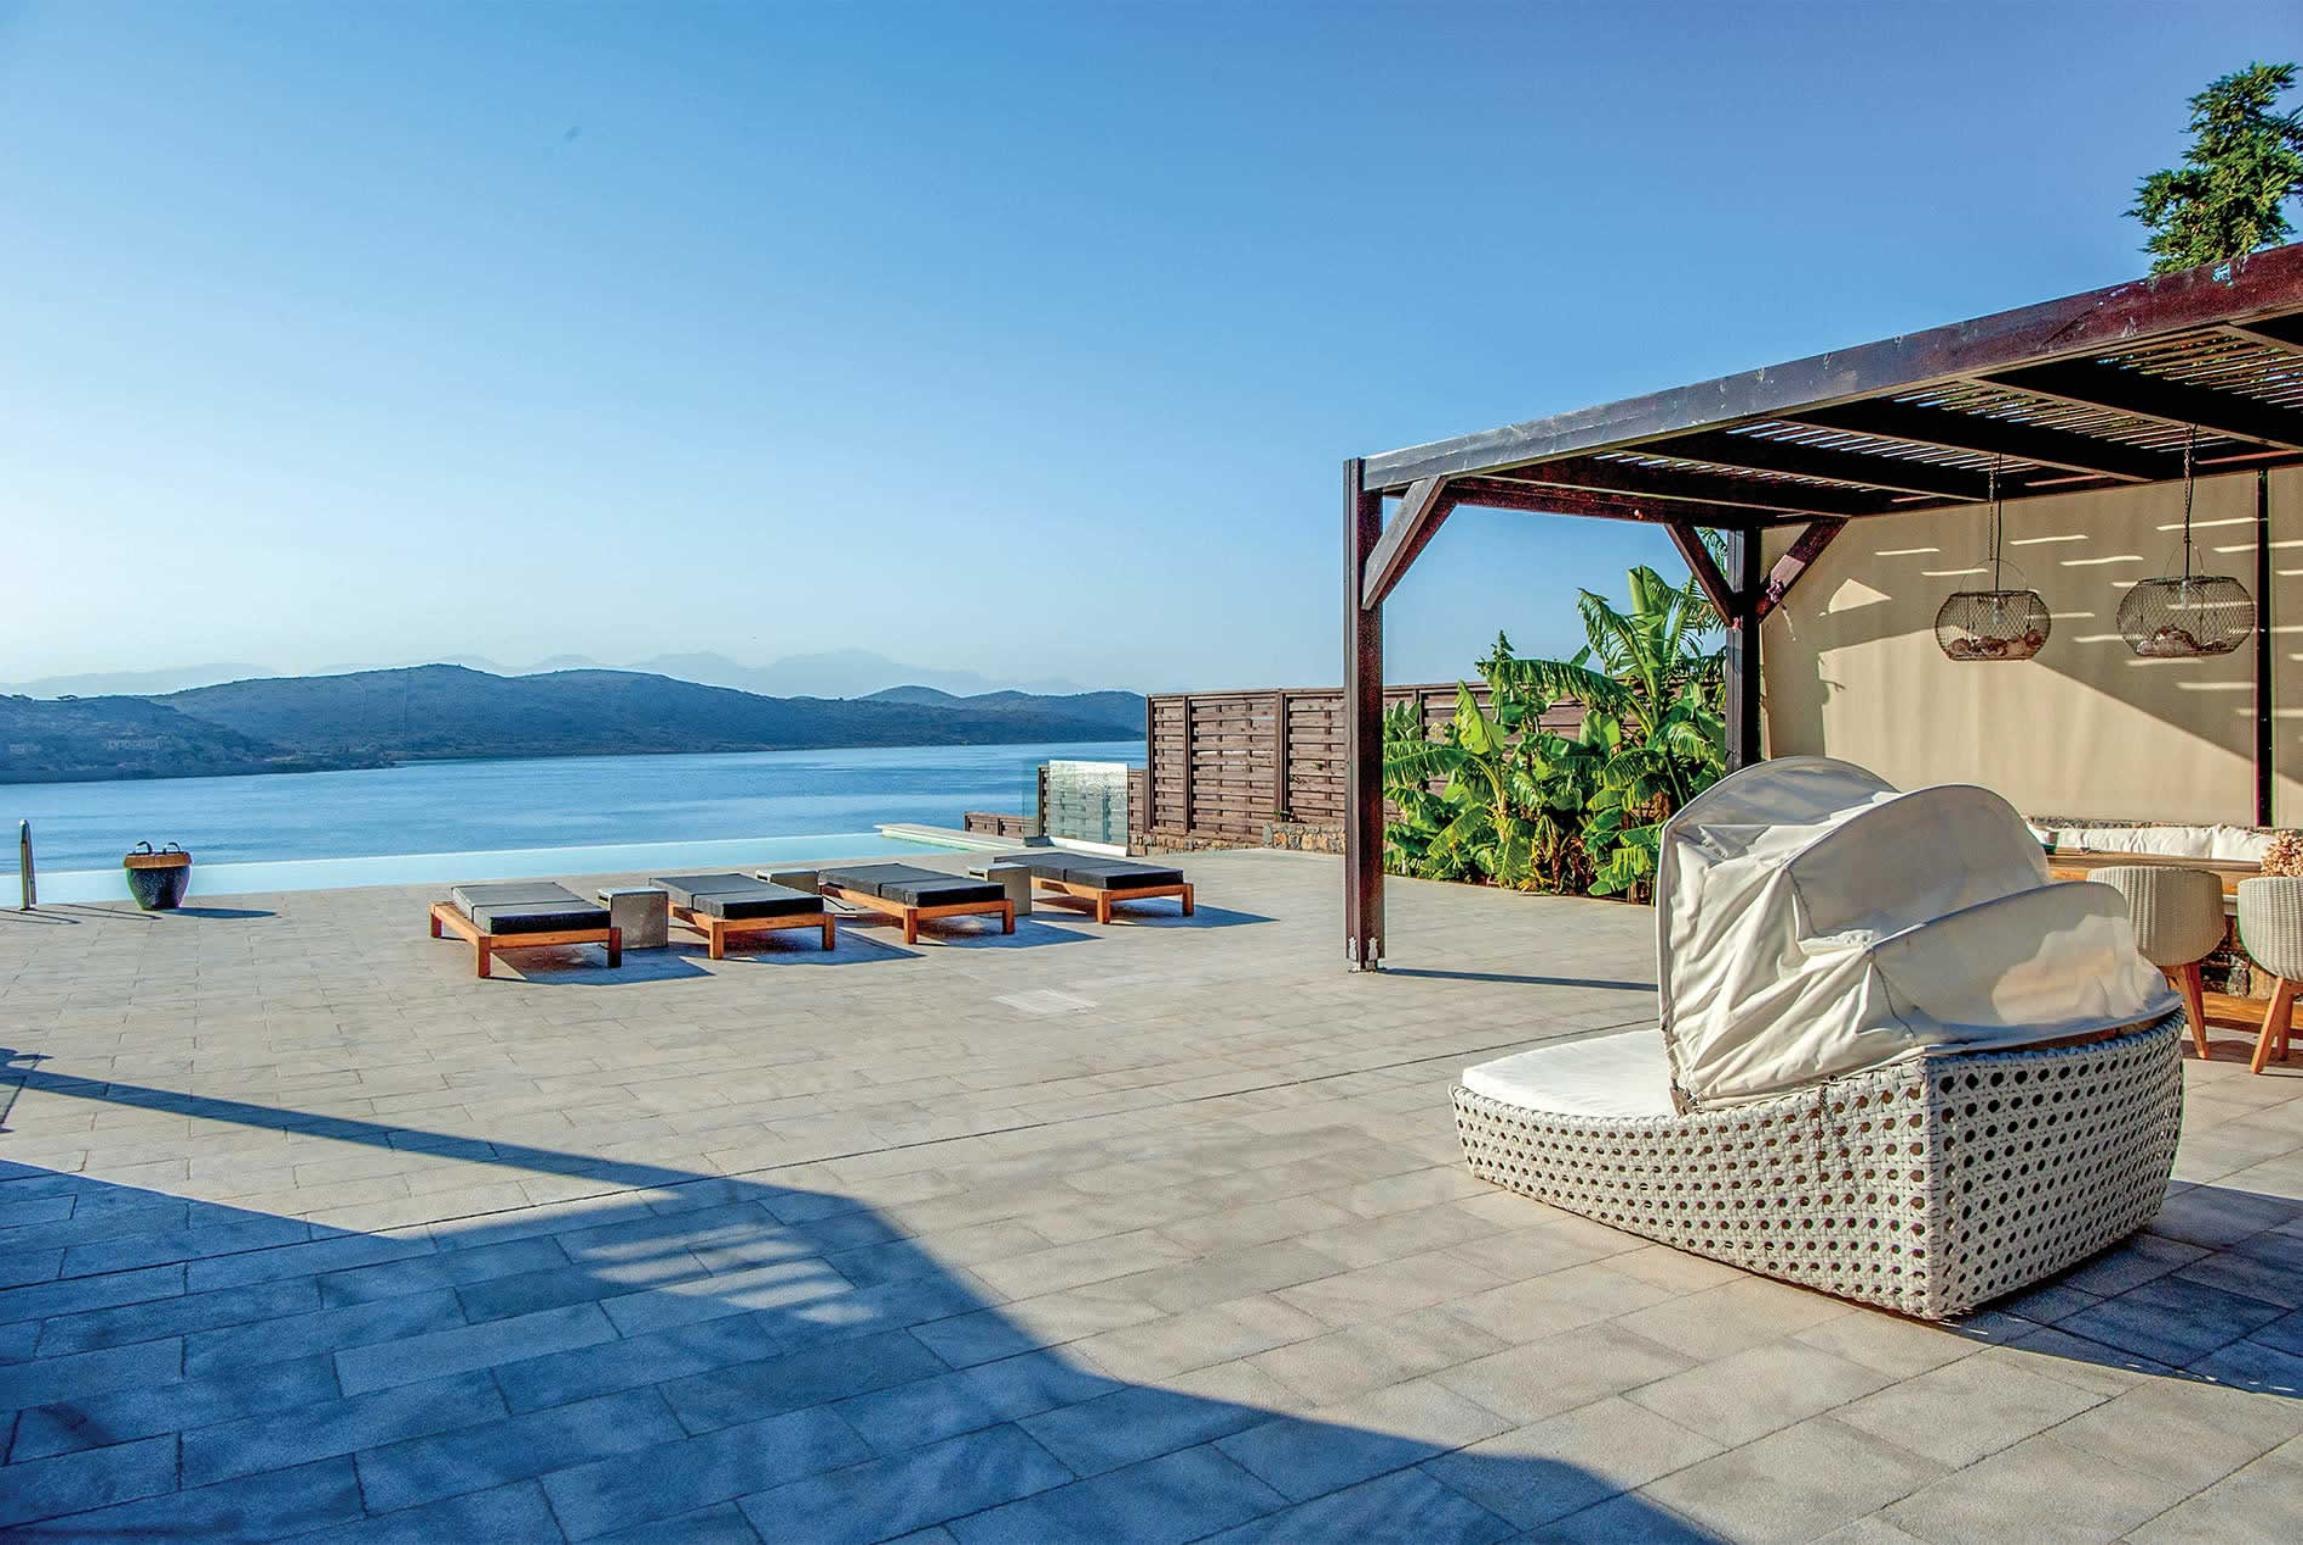 Ferienhaus Danae (2654195), Plaka, Kreta Nordküste, Kreta, Griechenland, Bild 29